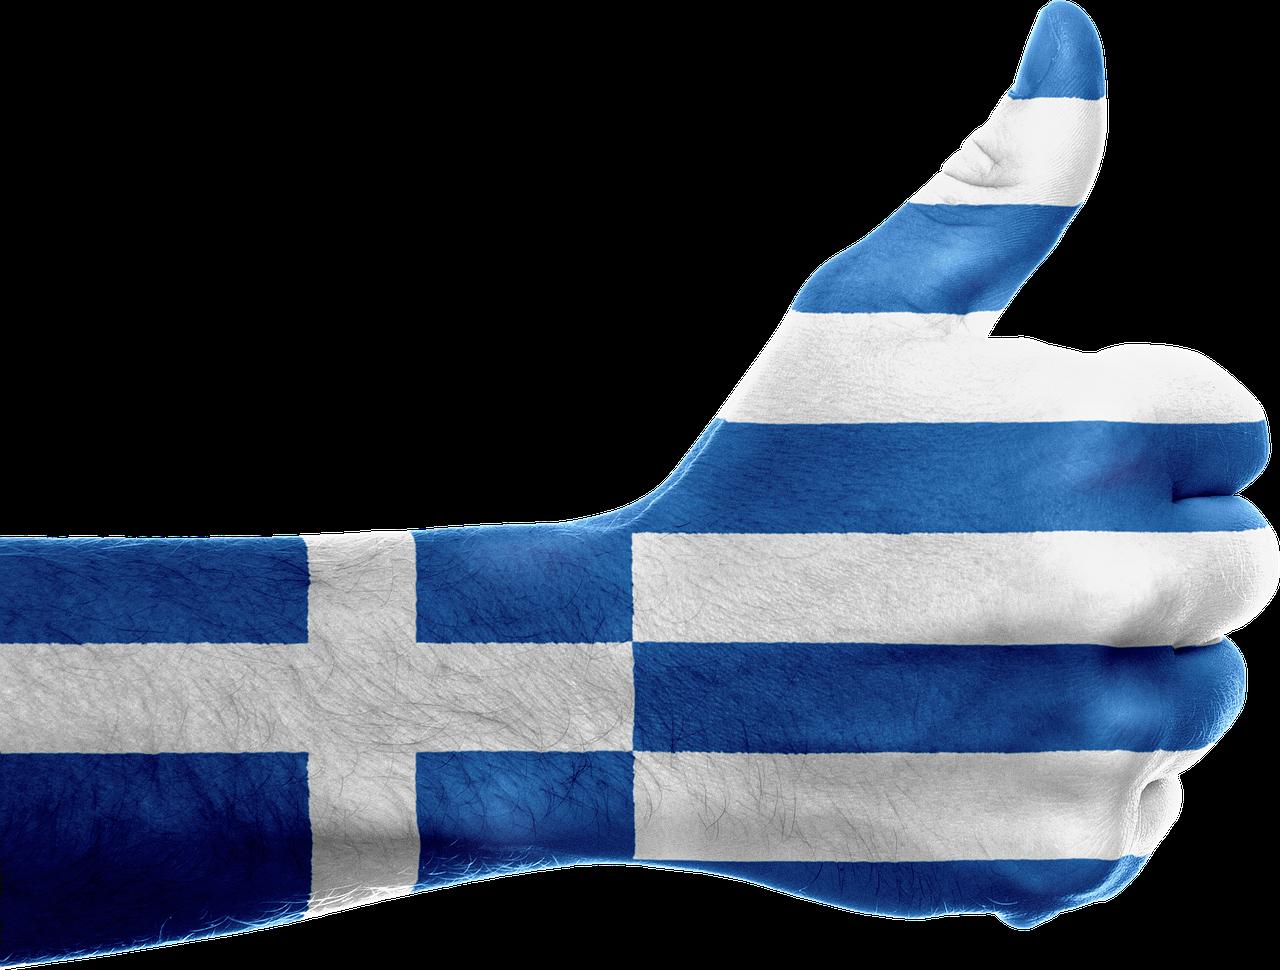 greece-985323_1280